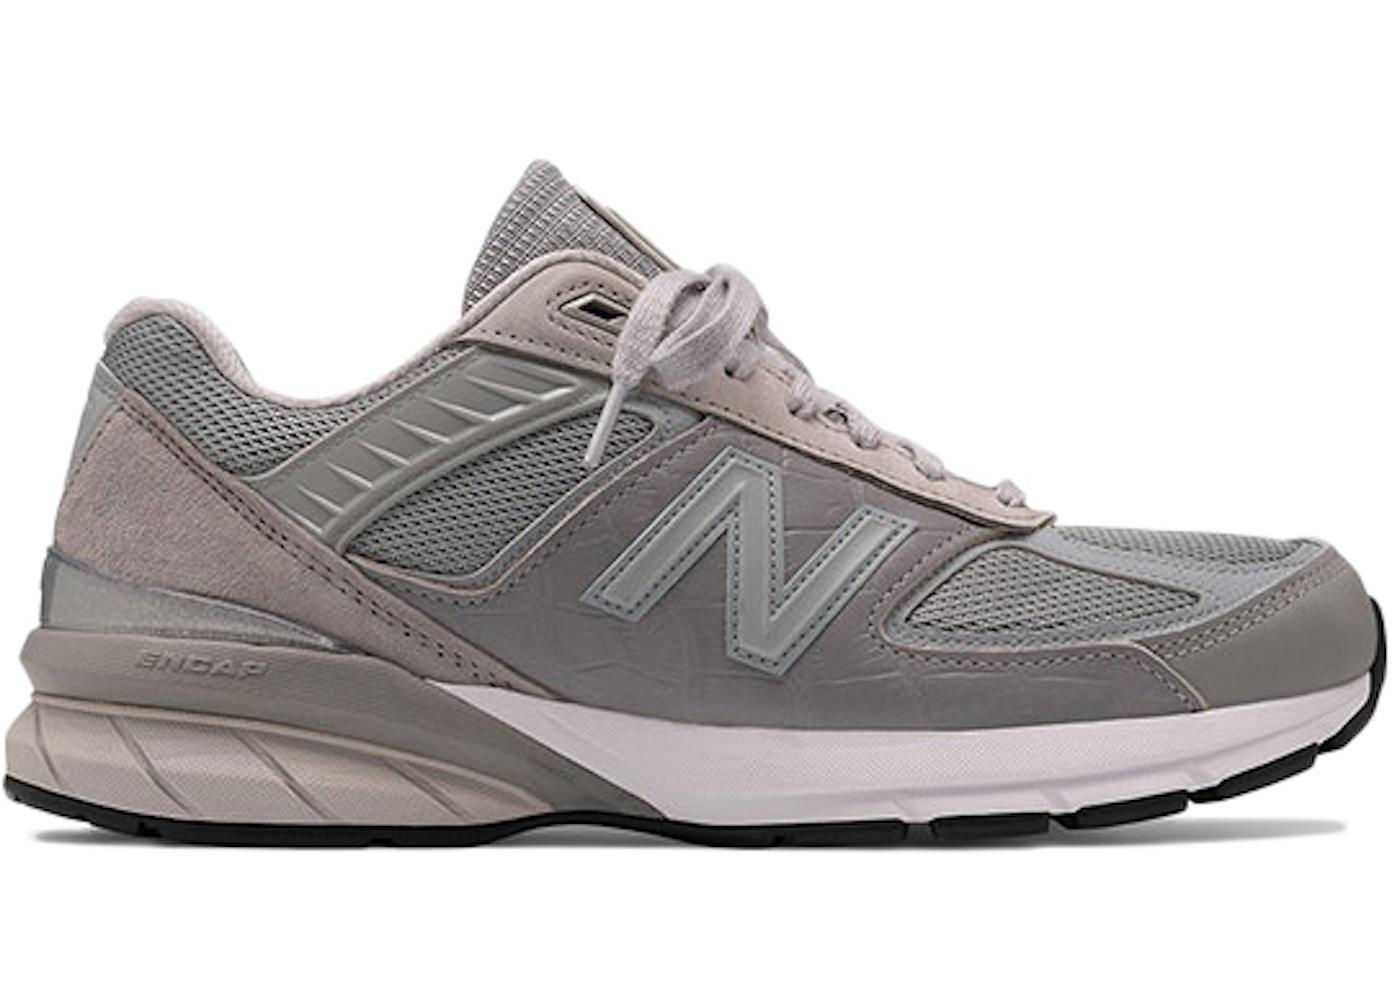 nouveau style 0c092 3f95d New Balance 990 v5 Engineered Garments Grey